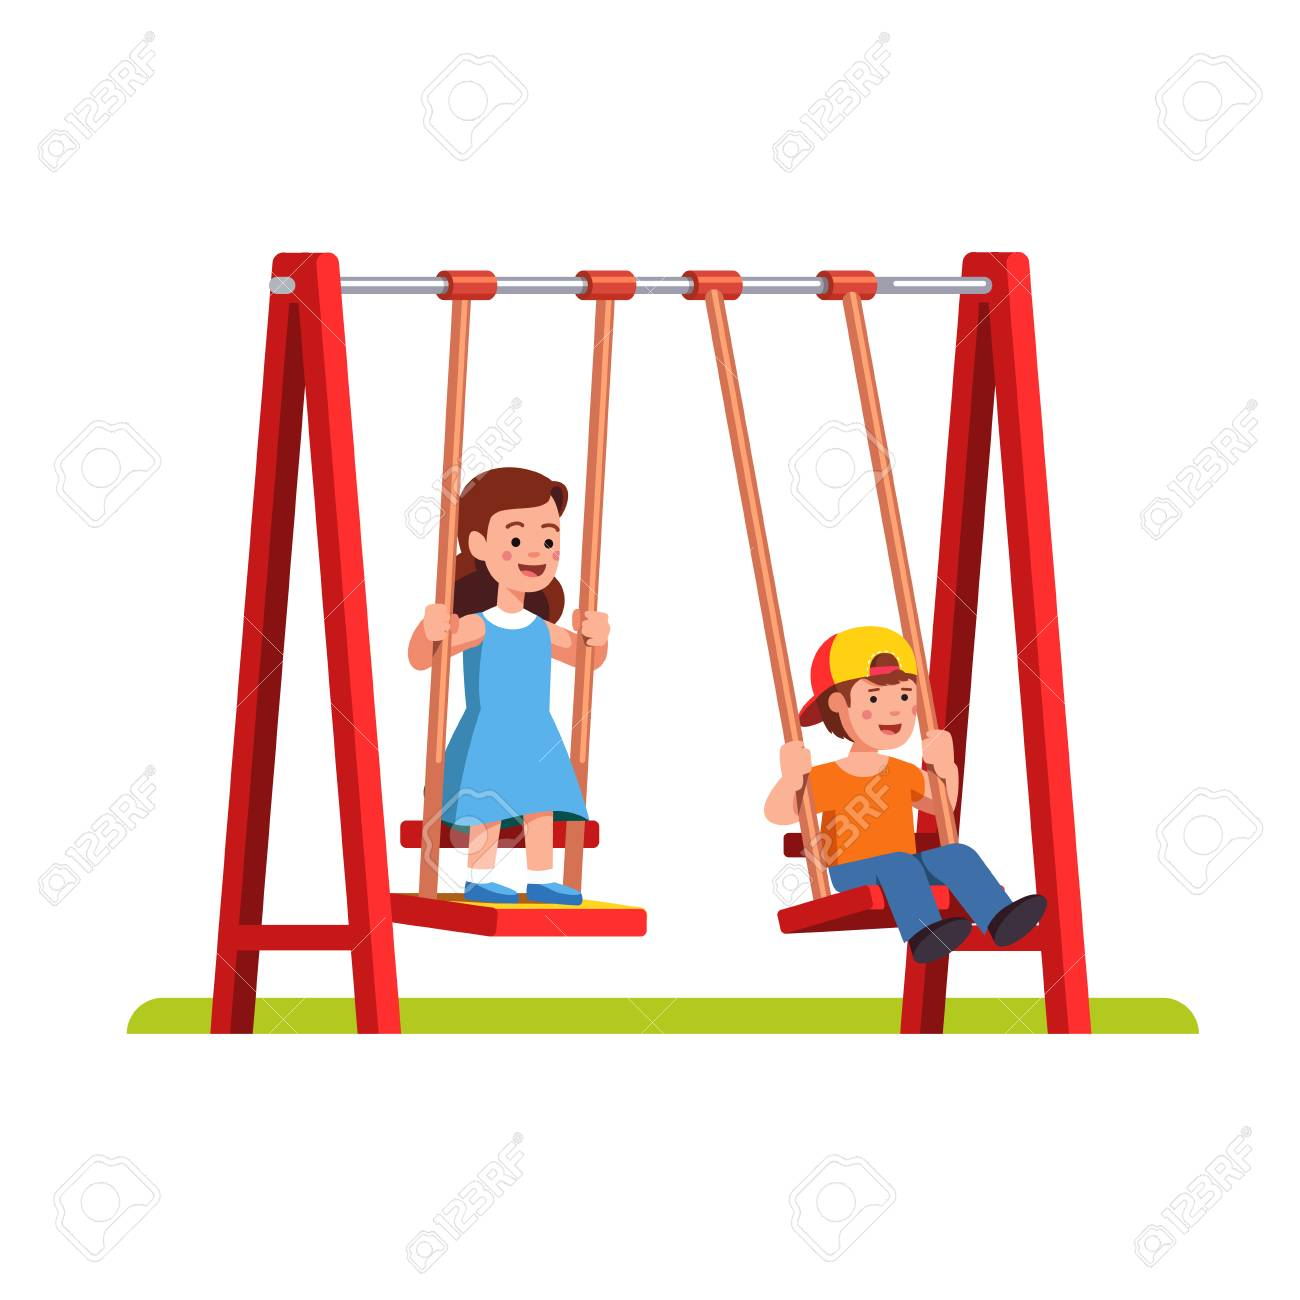 Boy and girl swinging on swing on playground.